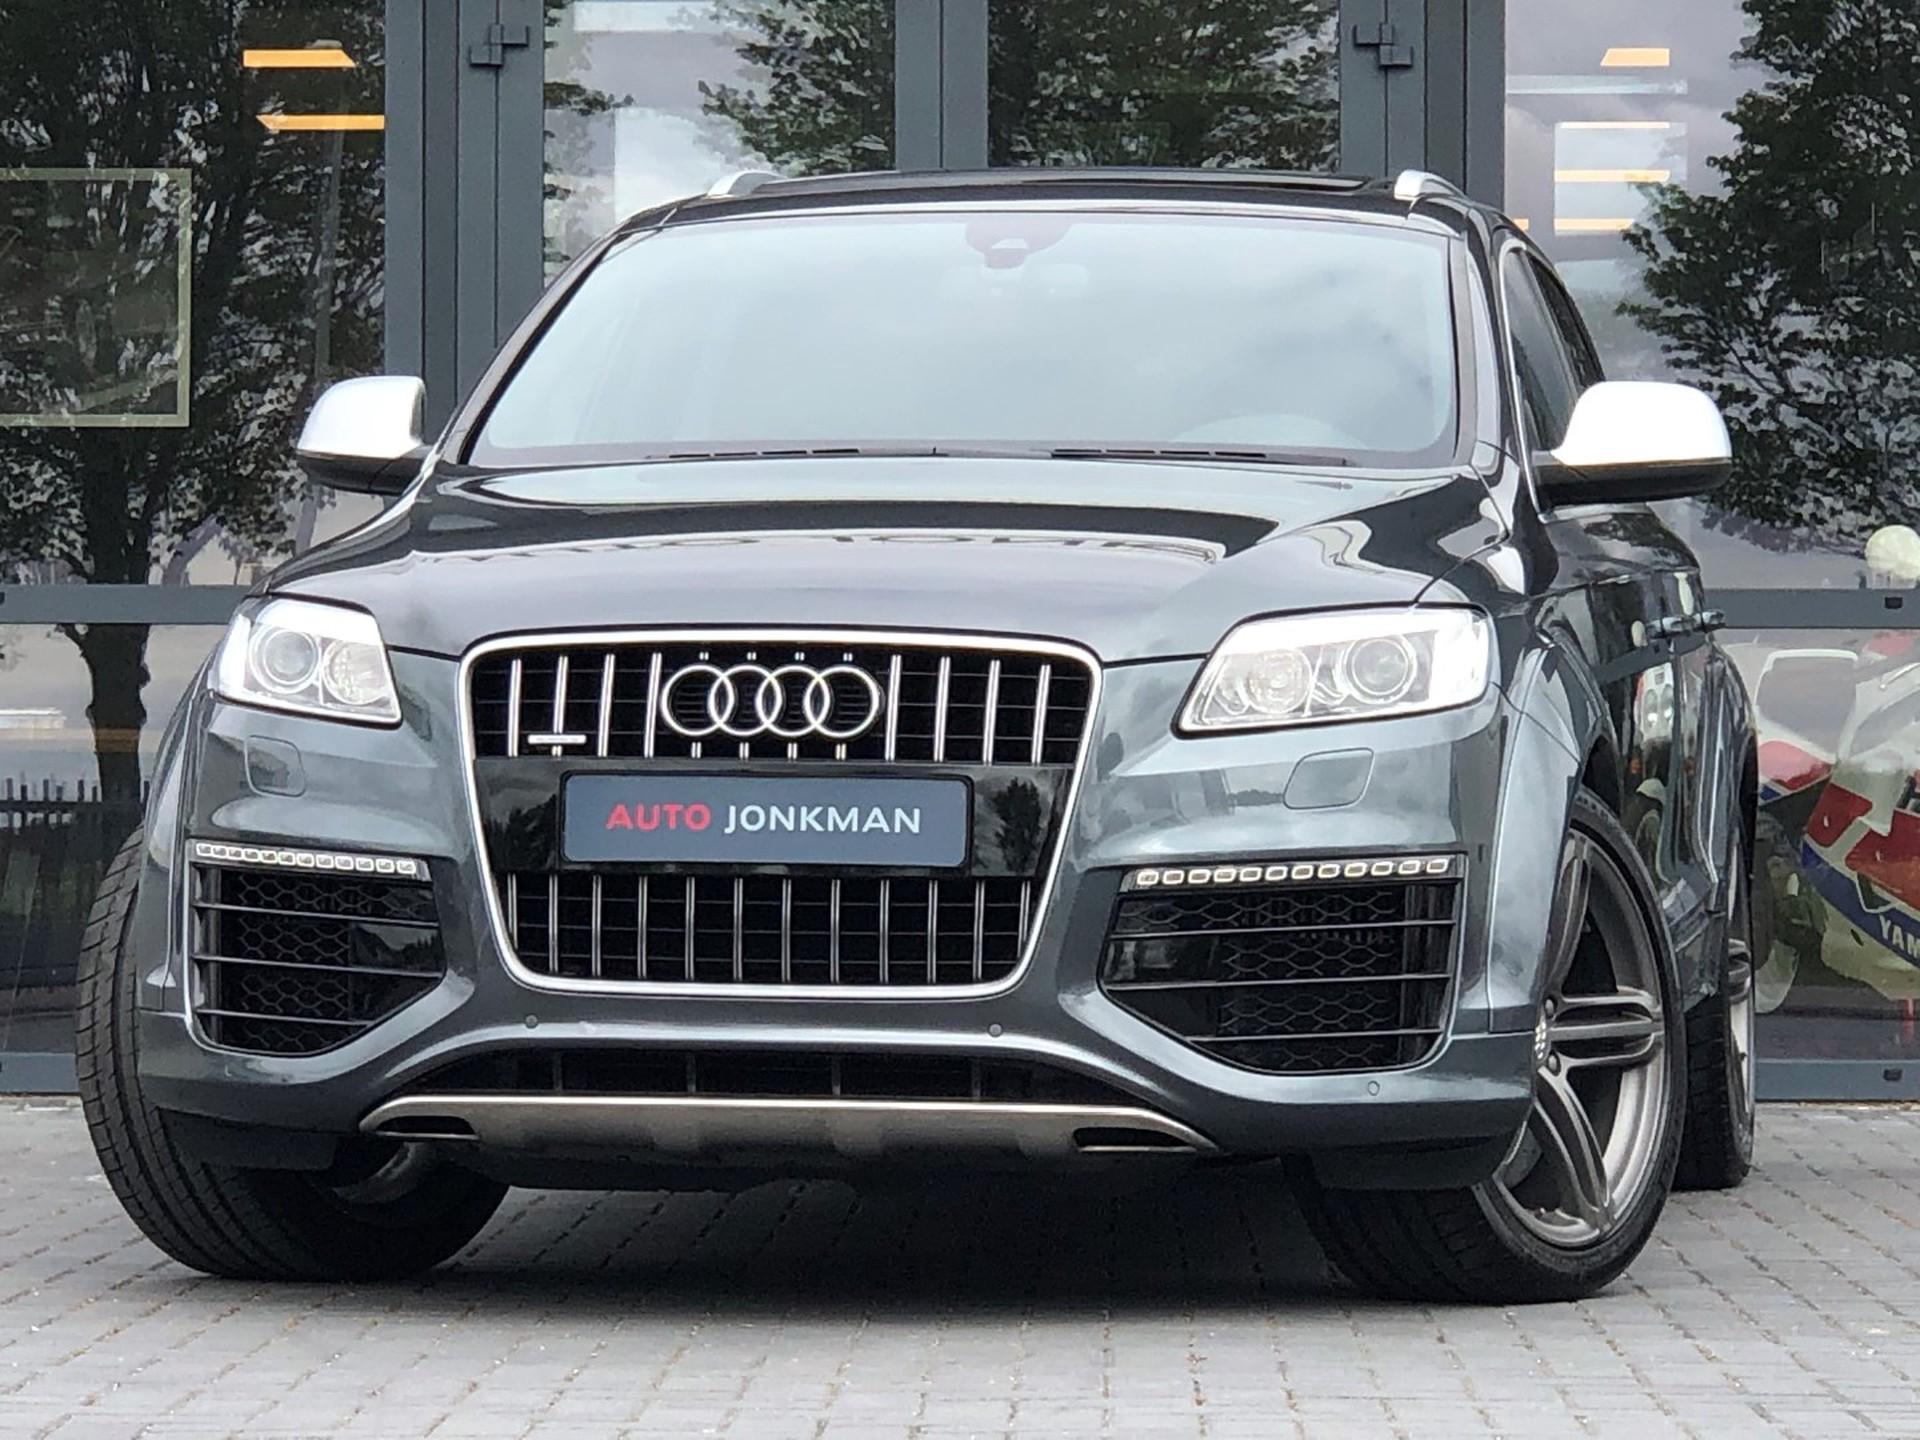 Audi-Q7-6.0 V12 TDI quattro 5+2 Keramische schijven, Dubbel dak, Adaptive cruise control, DVD , etc.-Auto Jonkman Berlikum